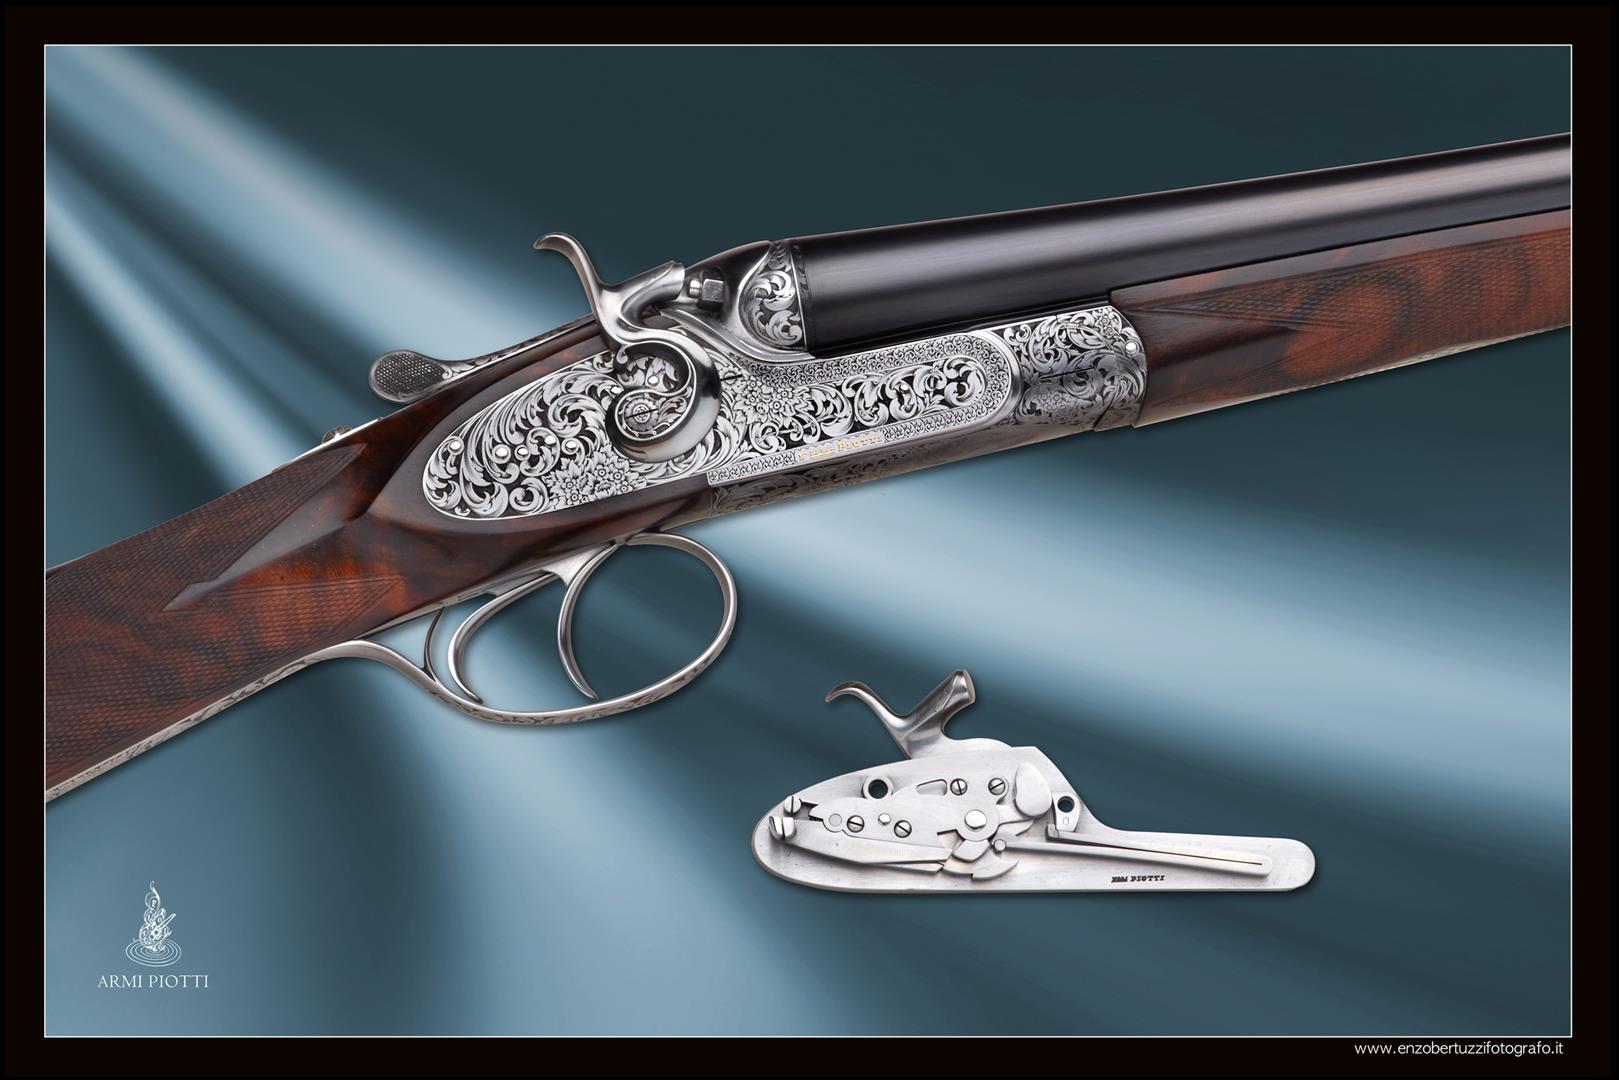 Piotti external hammer shotgun